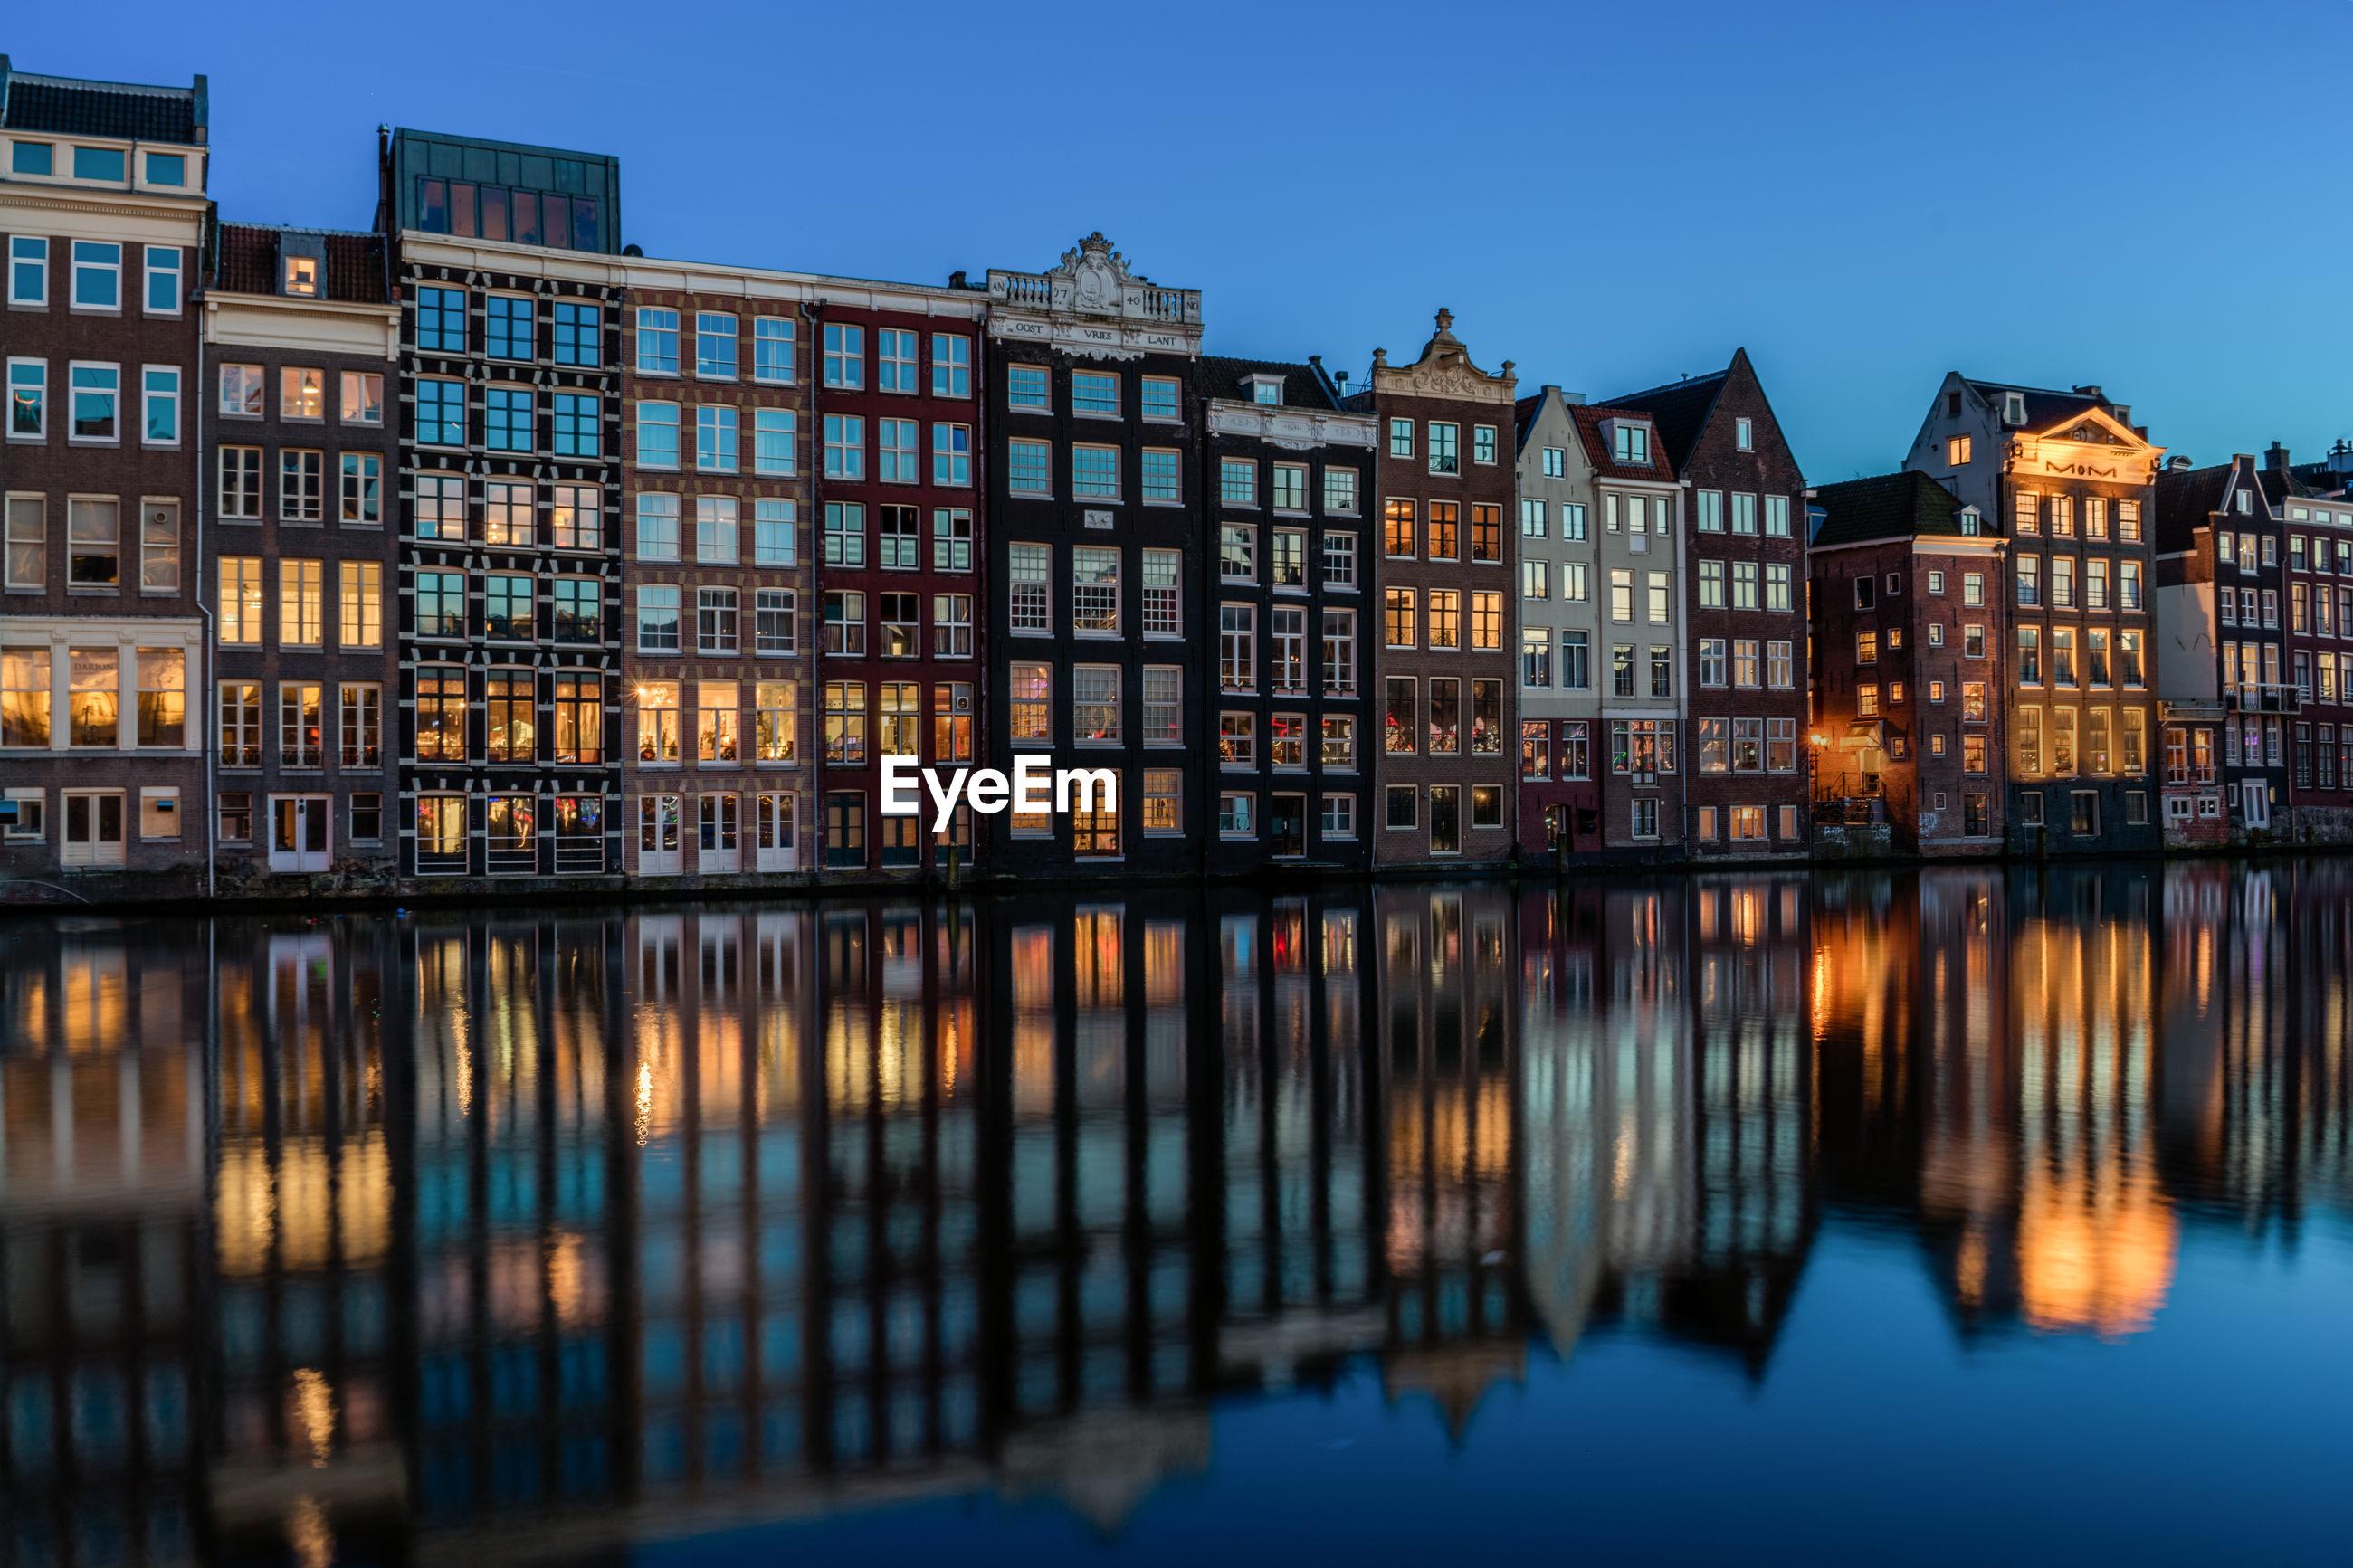 Reflection of illuminated row houses on canal at dusk